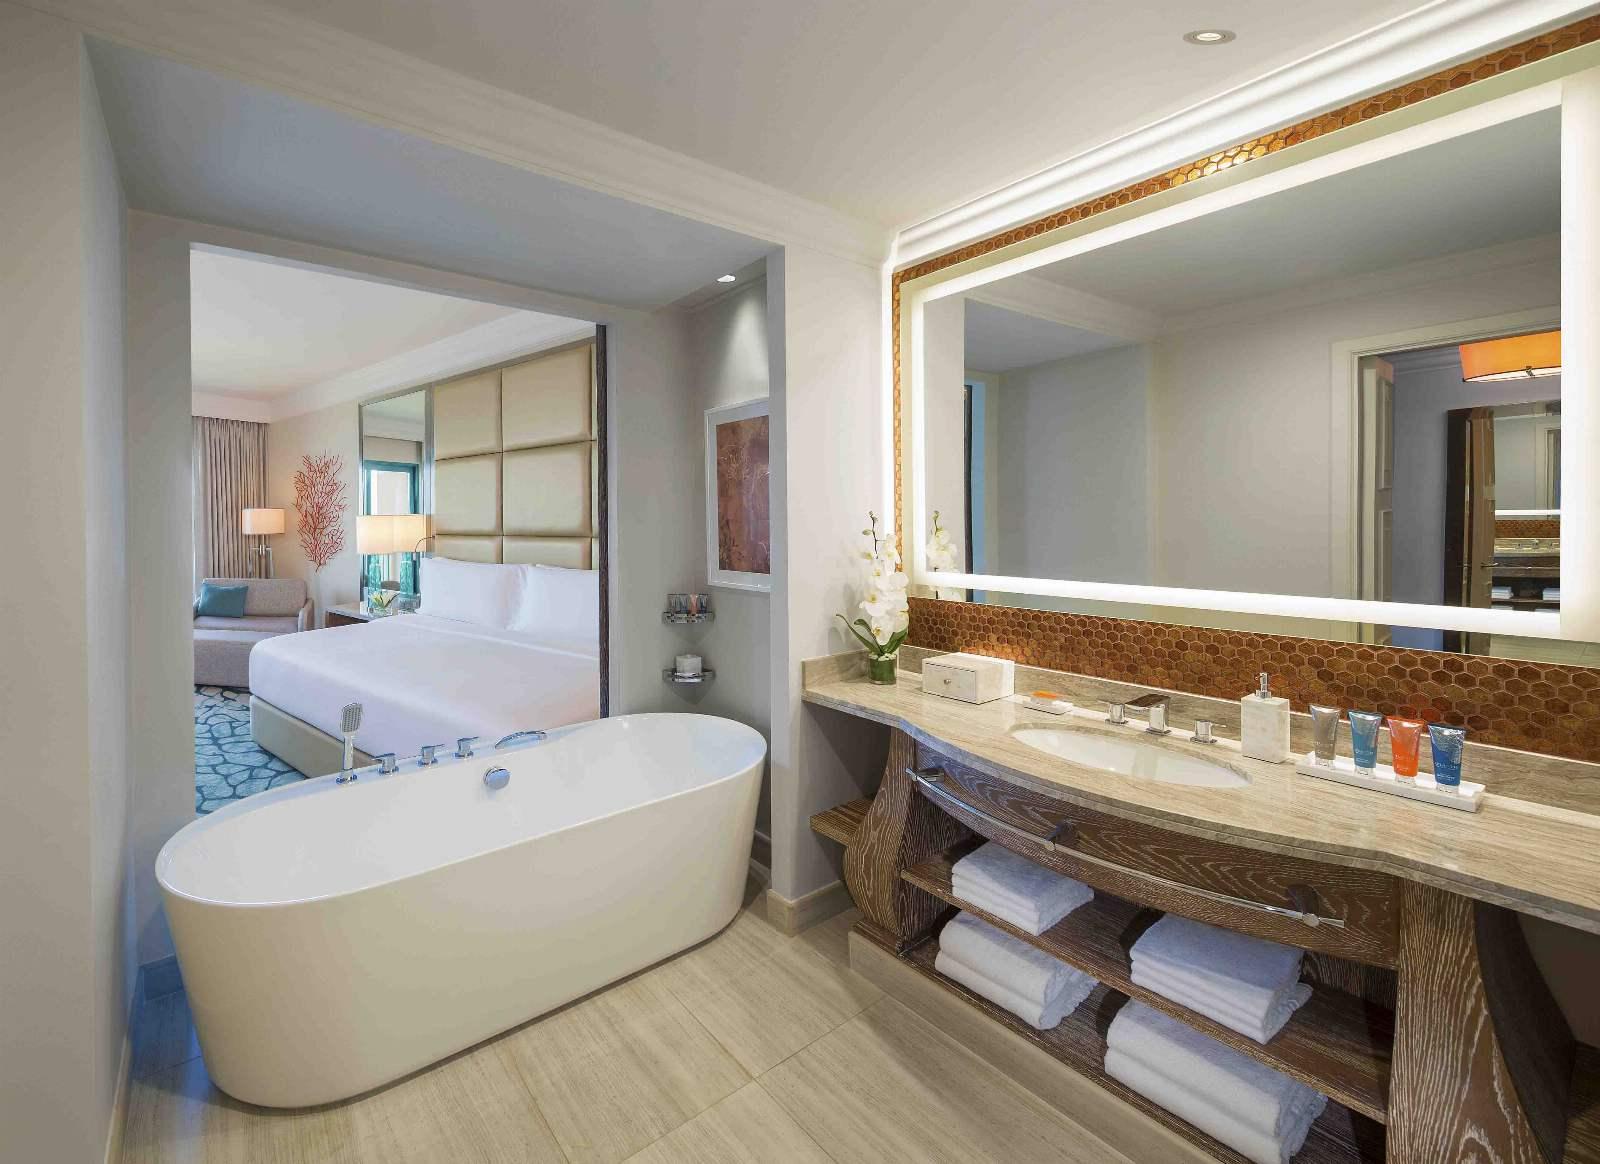 Atlantis, The Palm Ocean Deluxe Bathroom